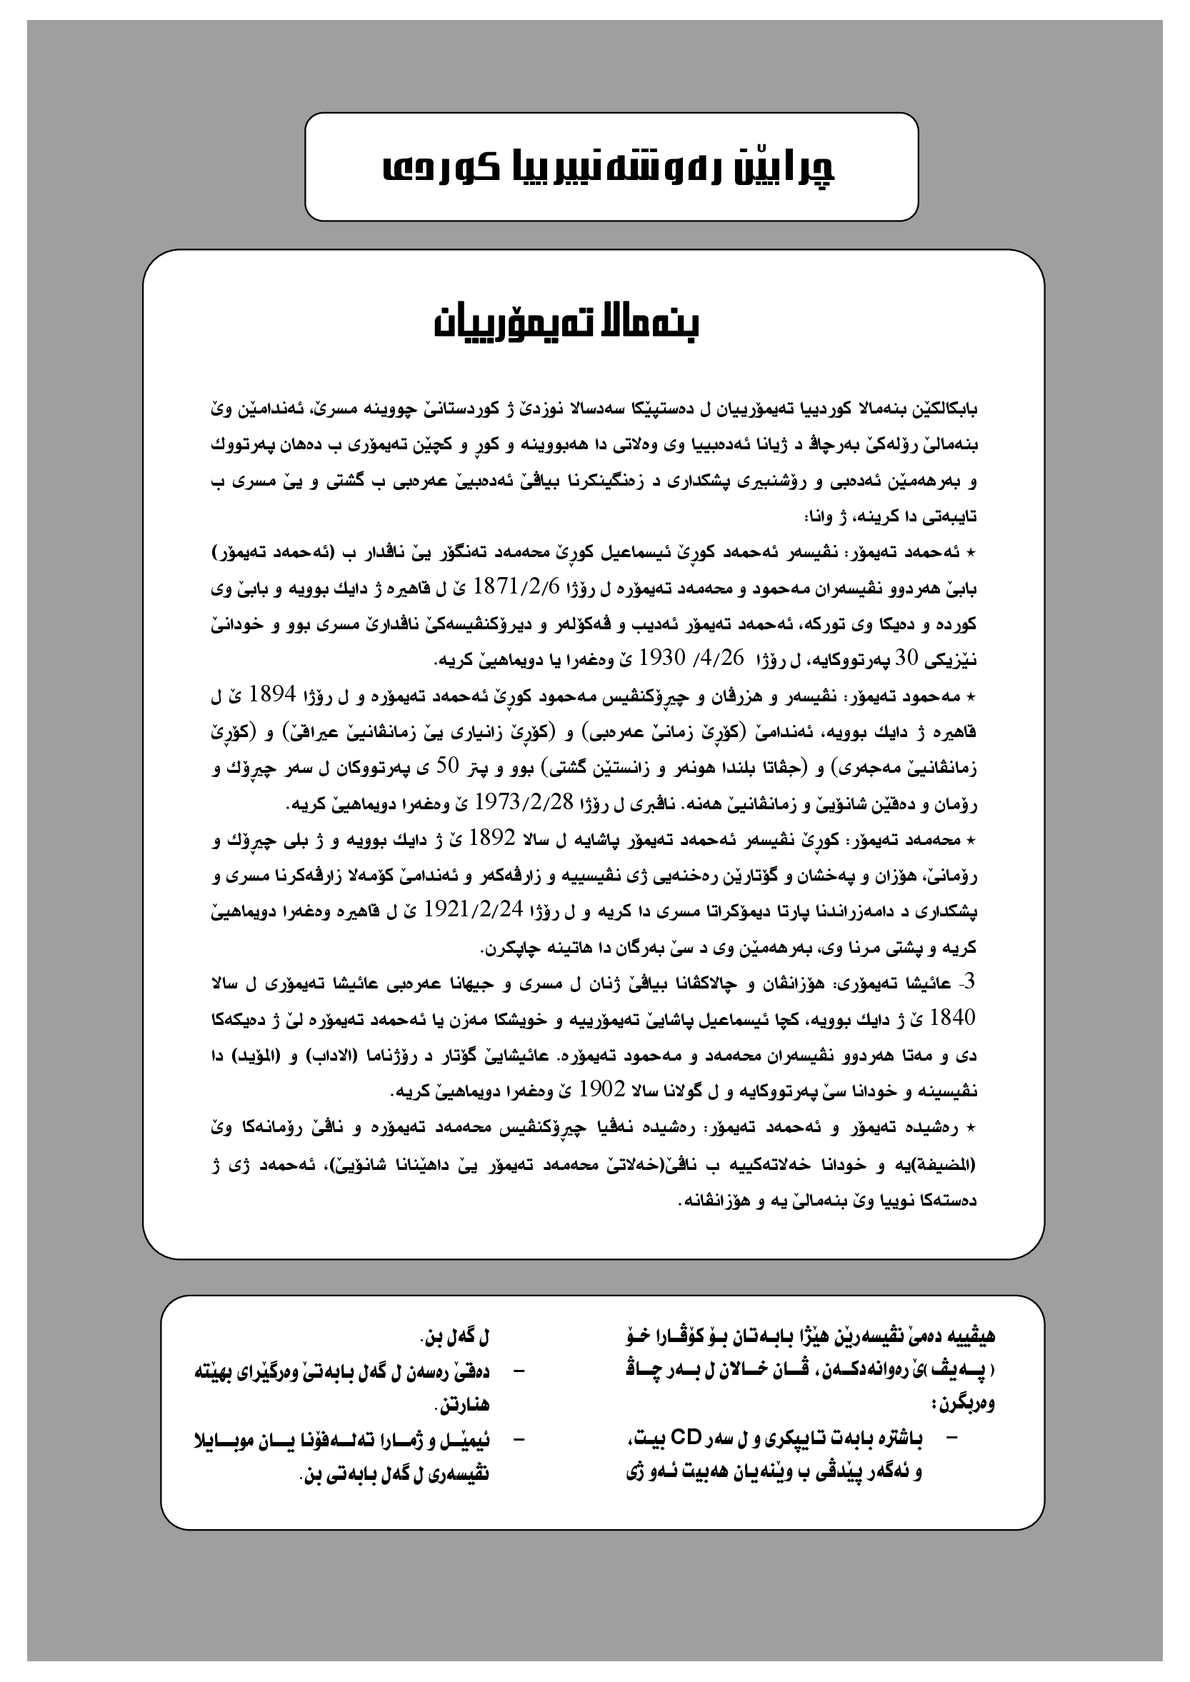 peyv63- peyv63-pdf------kovara peyv-yekitiya niviseren kurd duhok, her se heyvan careke derdixe